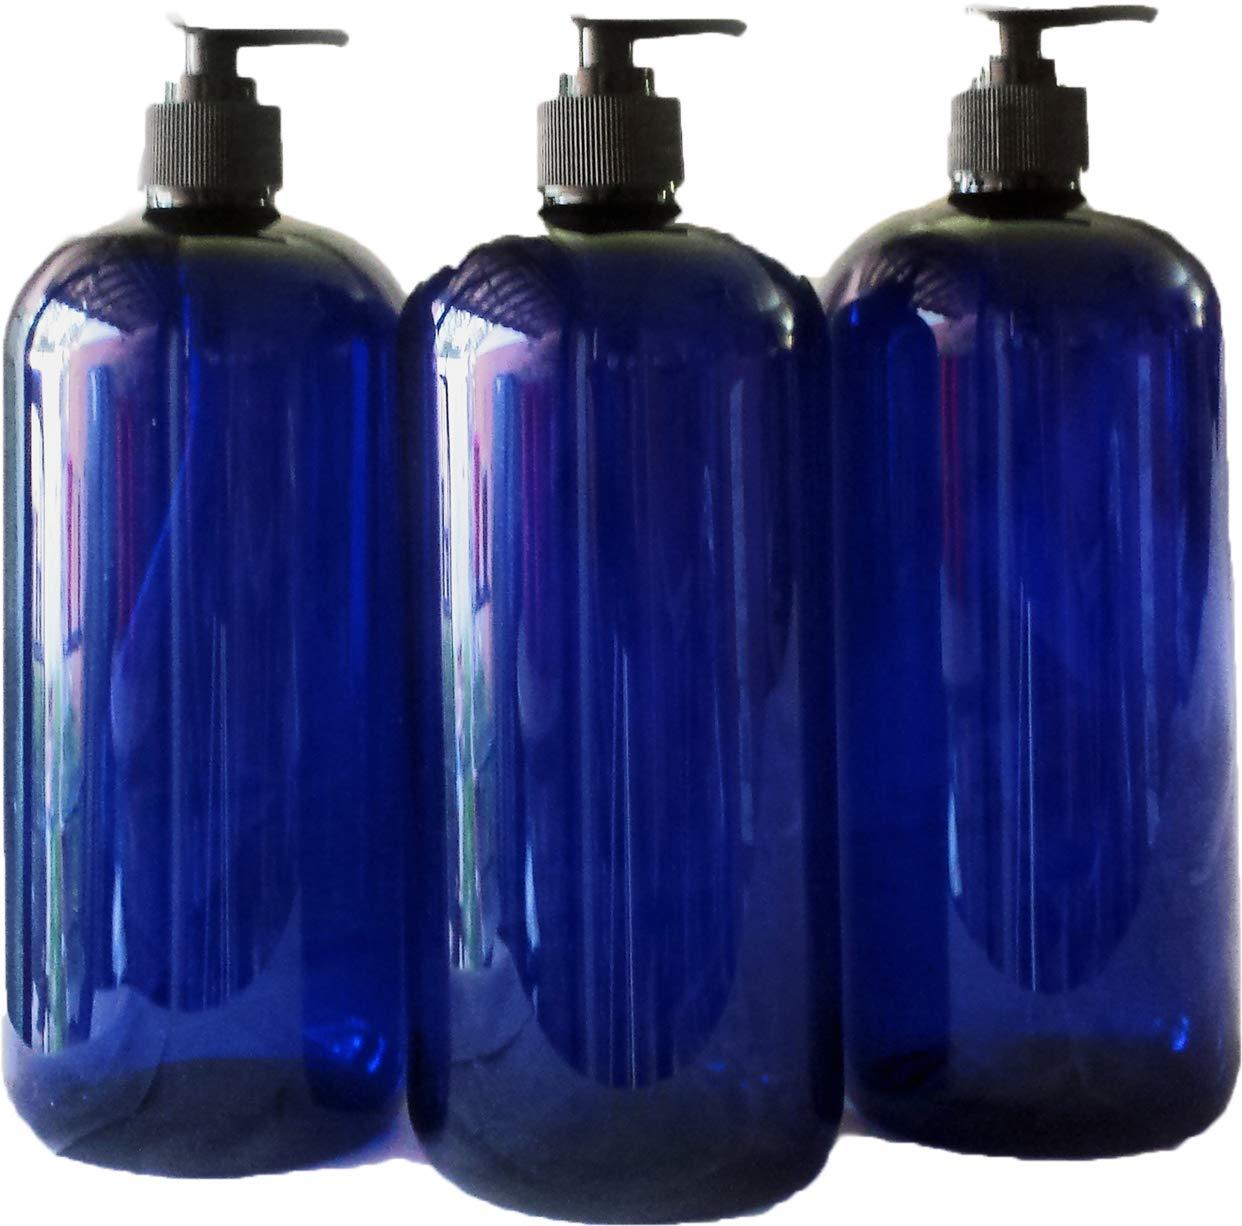 32 oz Blue Plastic PET Plastic Bottle with Black Hand Lotion Pump or Trigger Spray and Kraft Labels 3/pk SanDaveVA